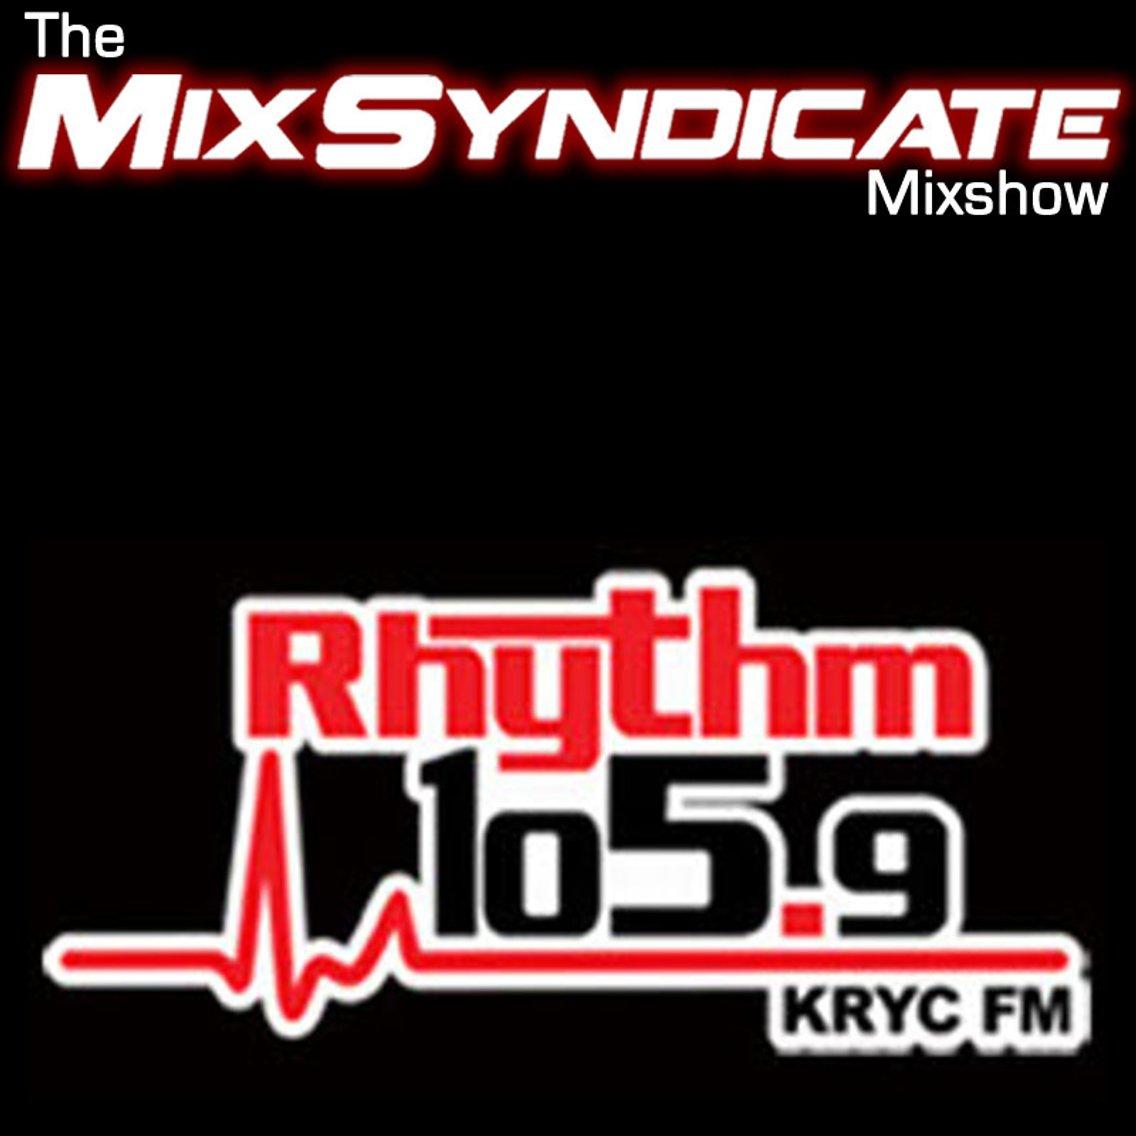 The Mix Syndicate Mixshow Rhythm 105.9 - imagen de portada